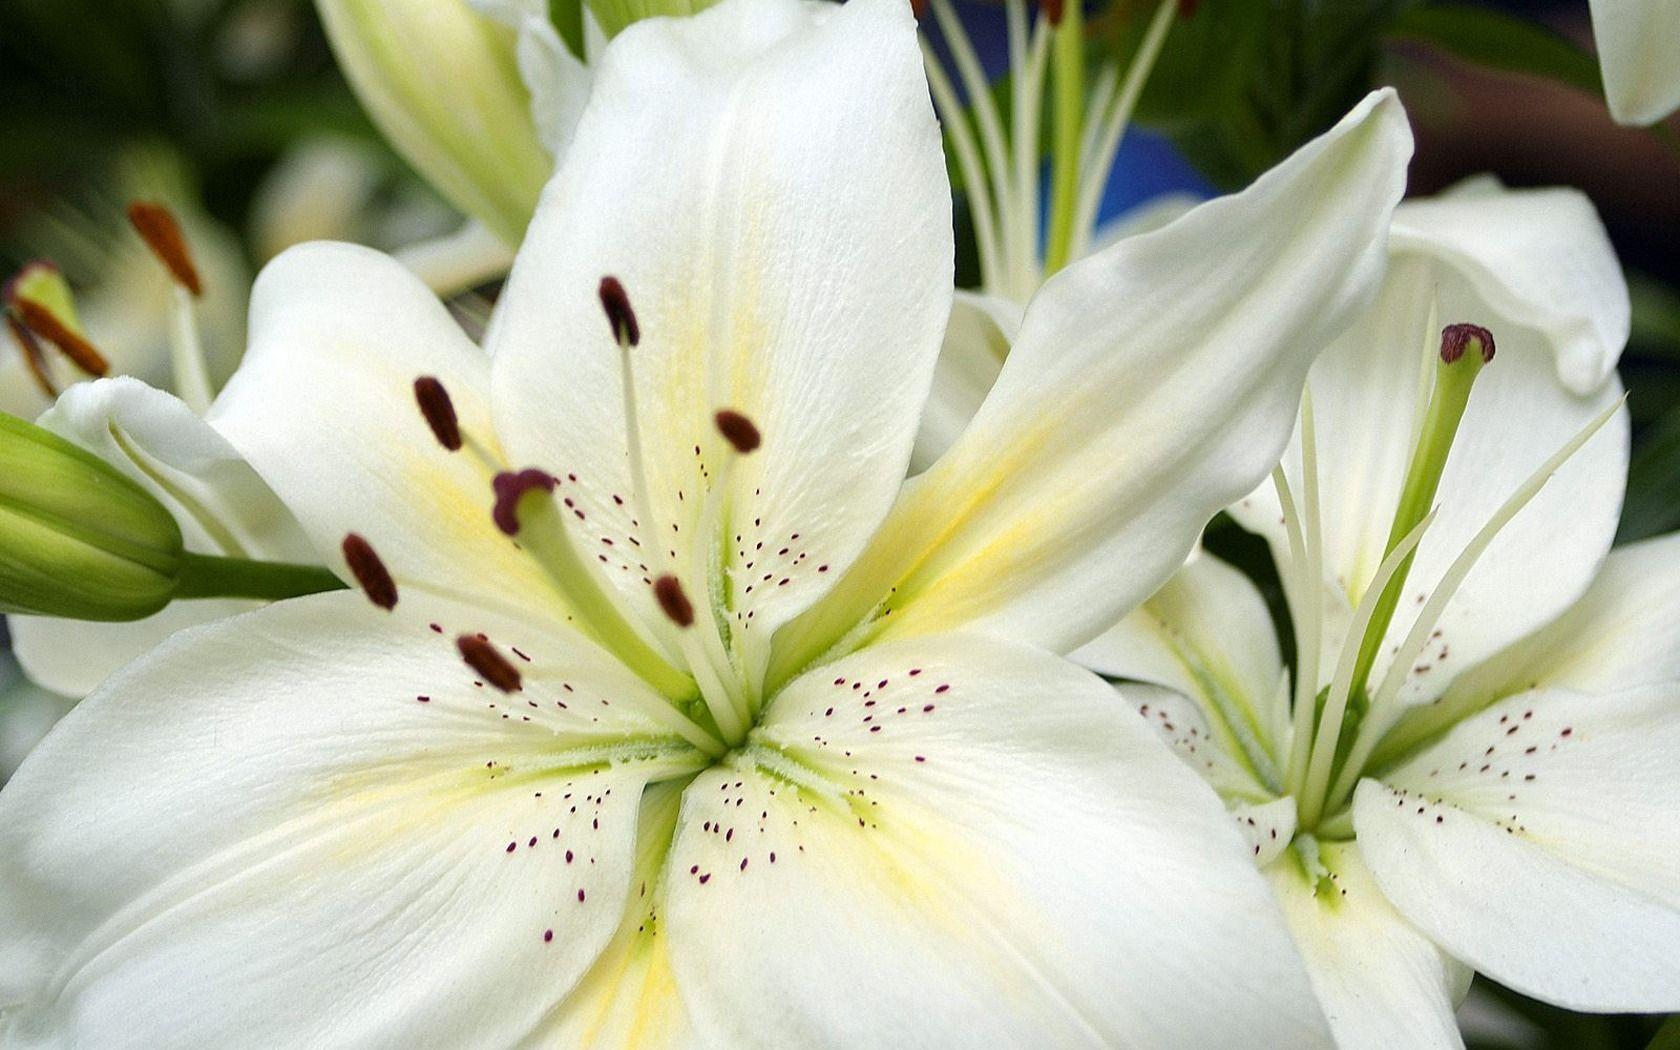 Imagini pentru white flowers fleurs pinterest white flowers imagini pentru white flowers mightylinksfo Image collections